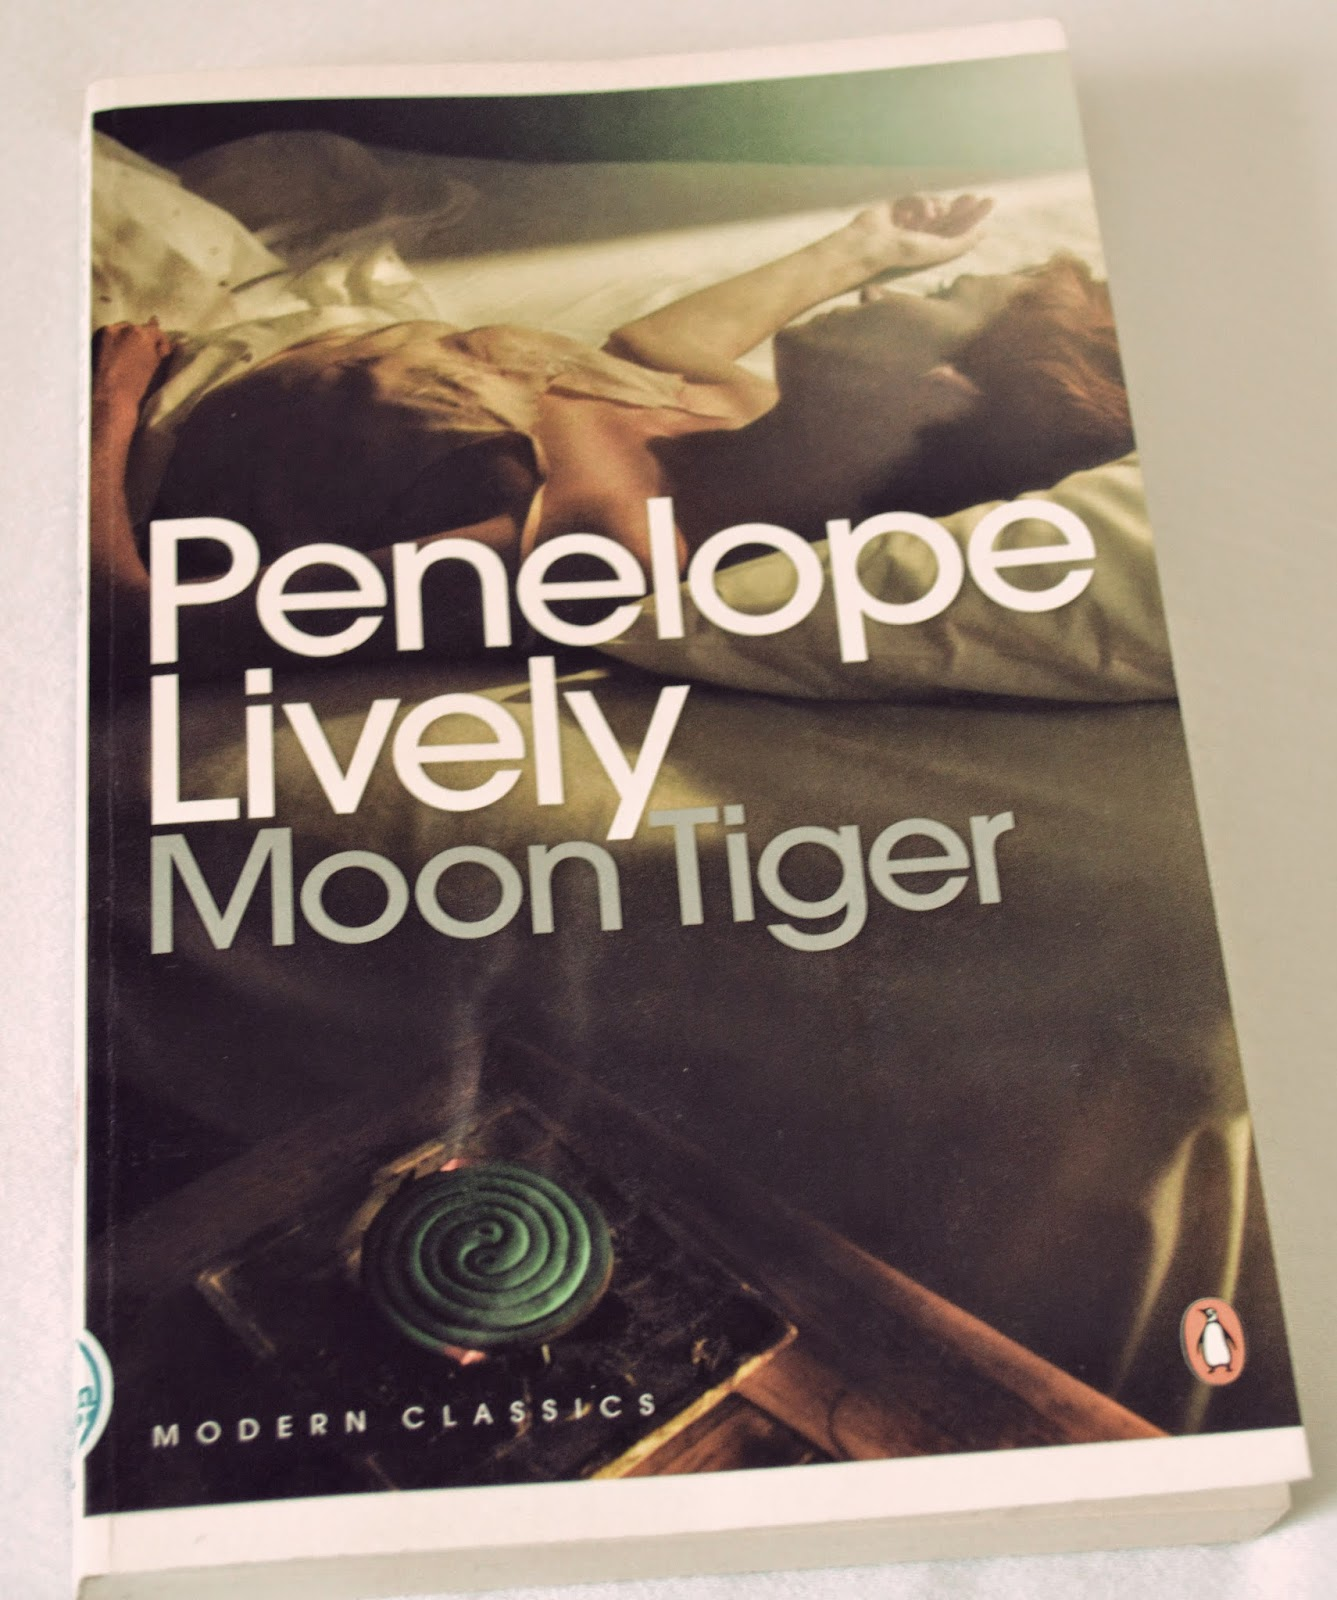 Penguin modern classics, female author, Booker Prize winner, 1987, Penelope Lively, Moon Tiger, Egypt, war, world war II, war correspondent, lovers, glamorous, review, book, literature,